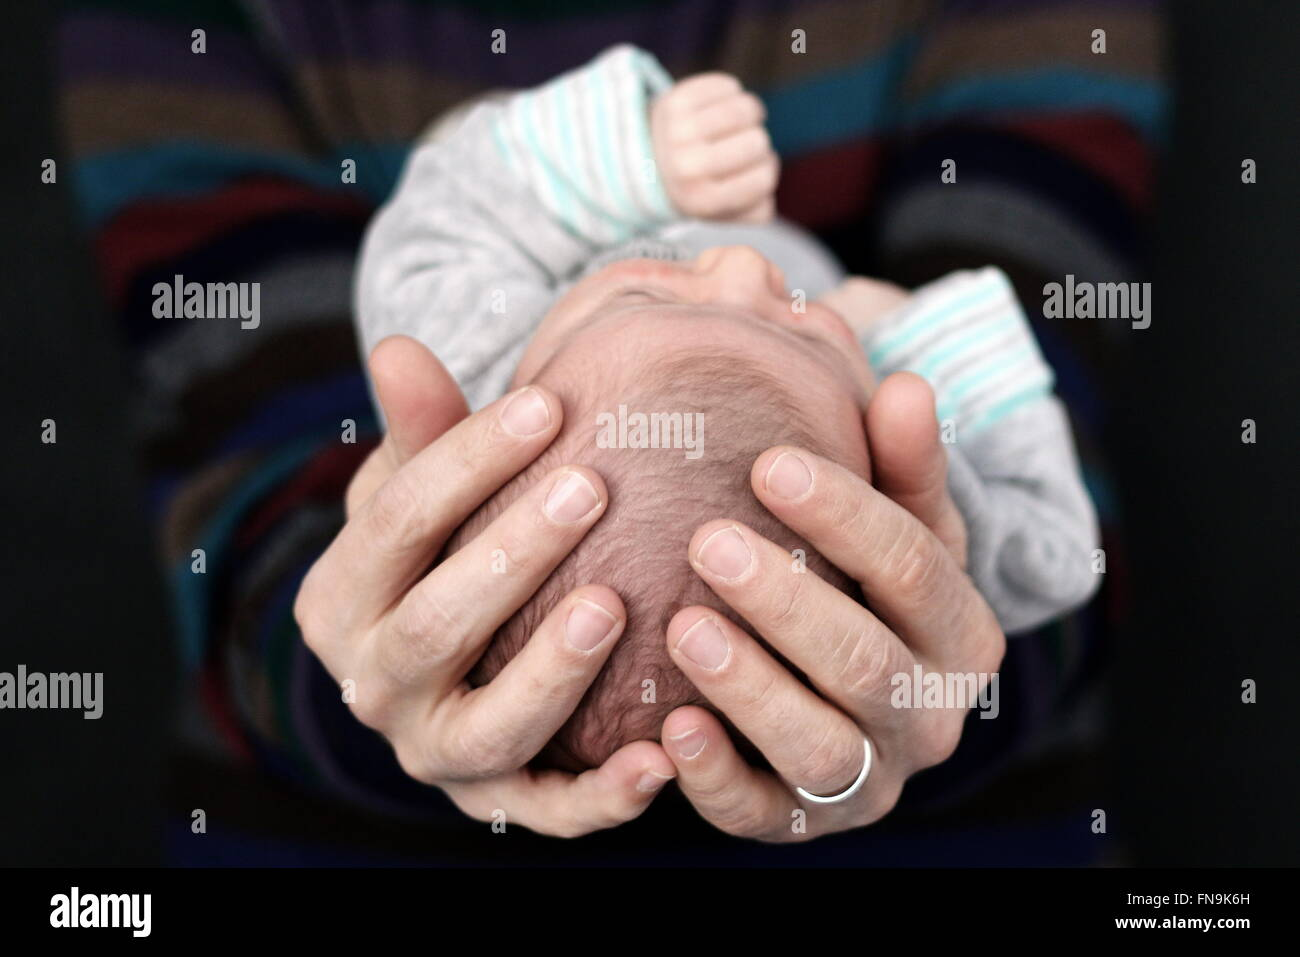 Father holding newborn baby boy - Stock Image